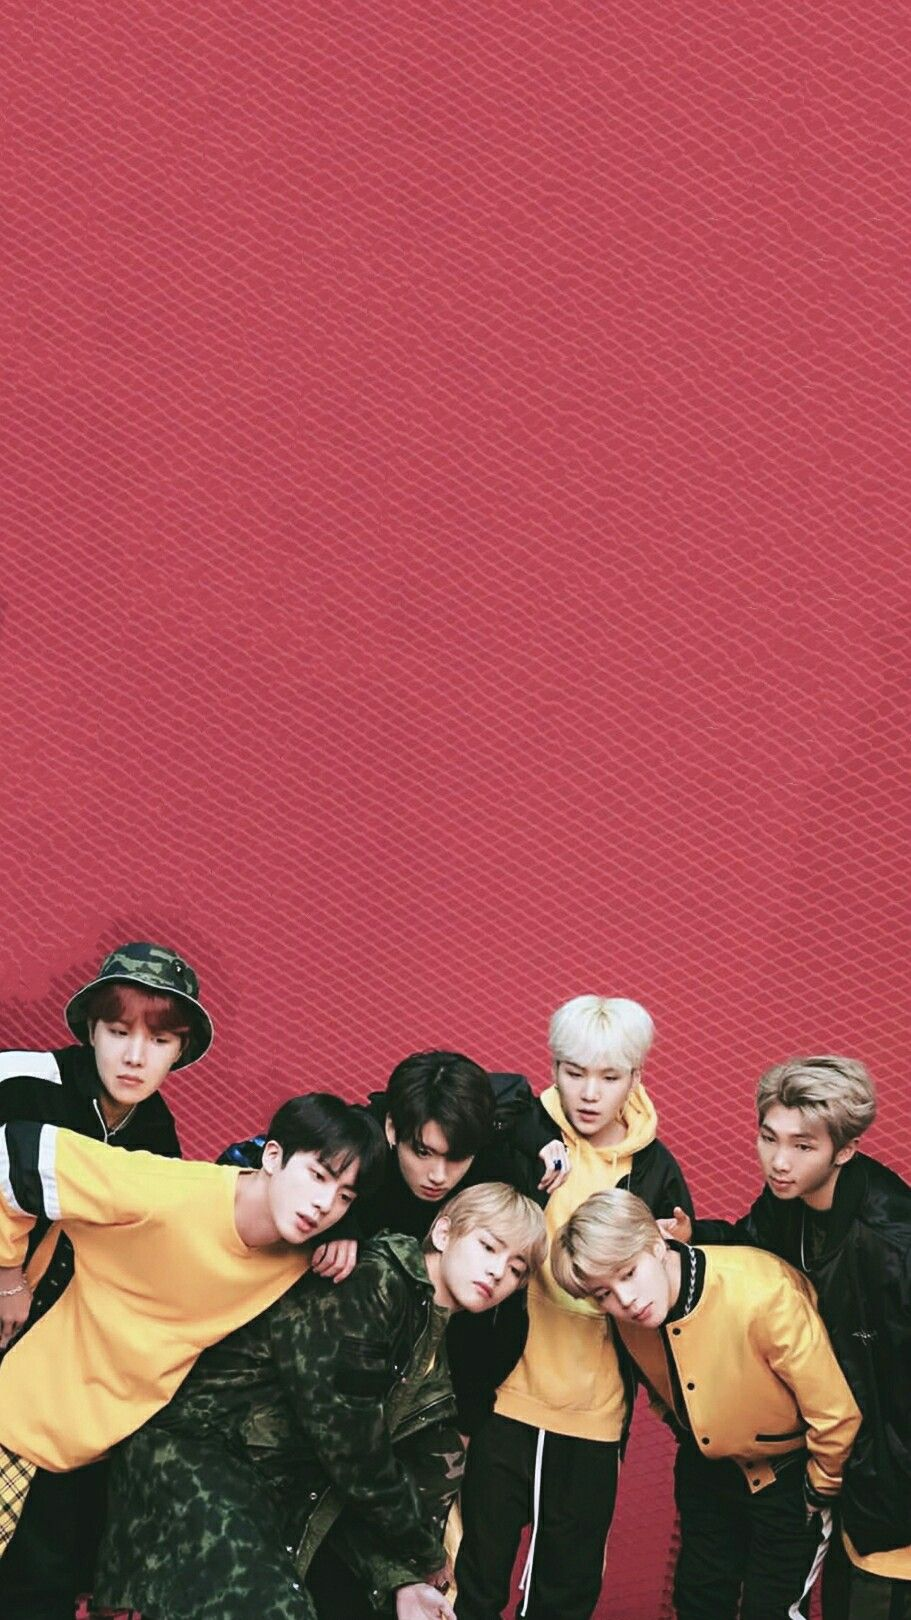 Bts Edits Bts Wallpapers Bts Japan Fanclub Update Pls Make